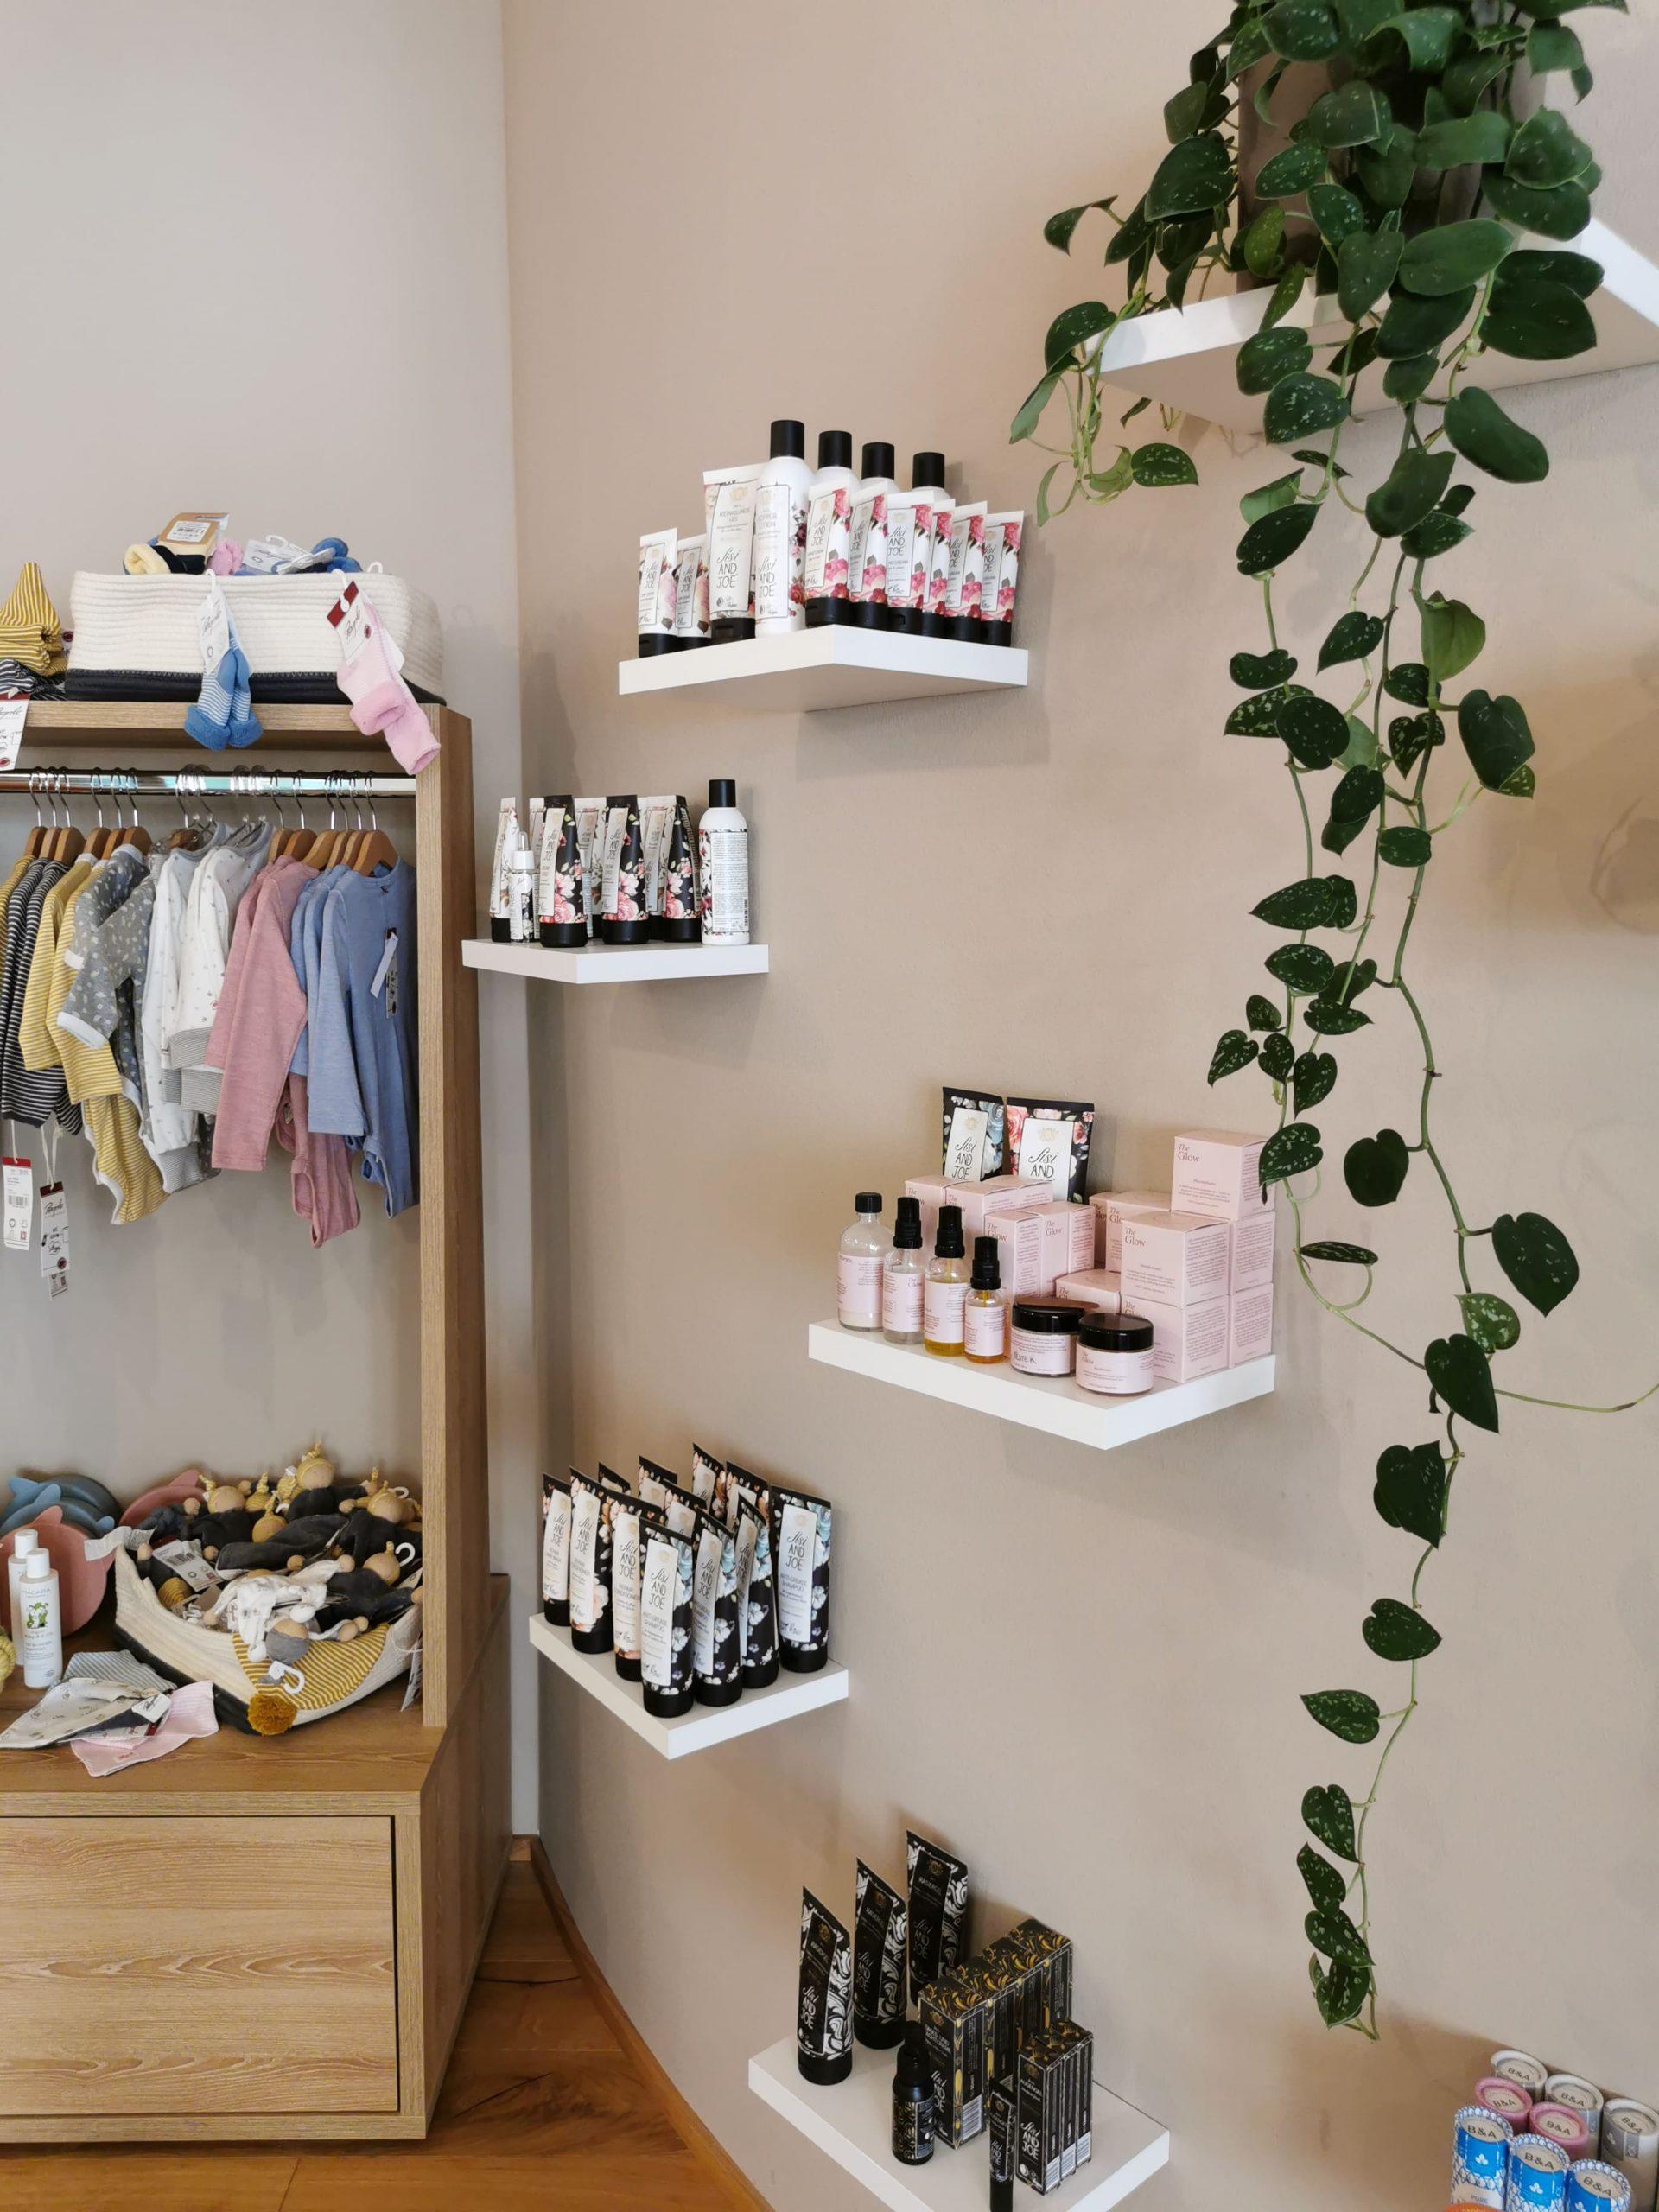 Kauri Store - Cosmesi biologica e vegetale